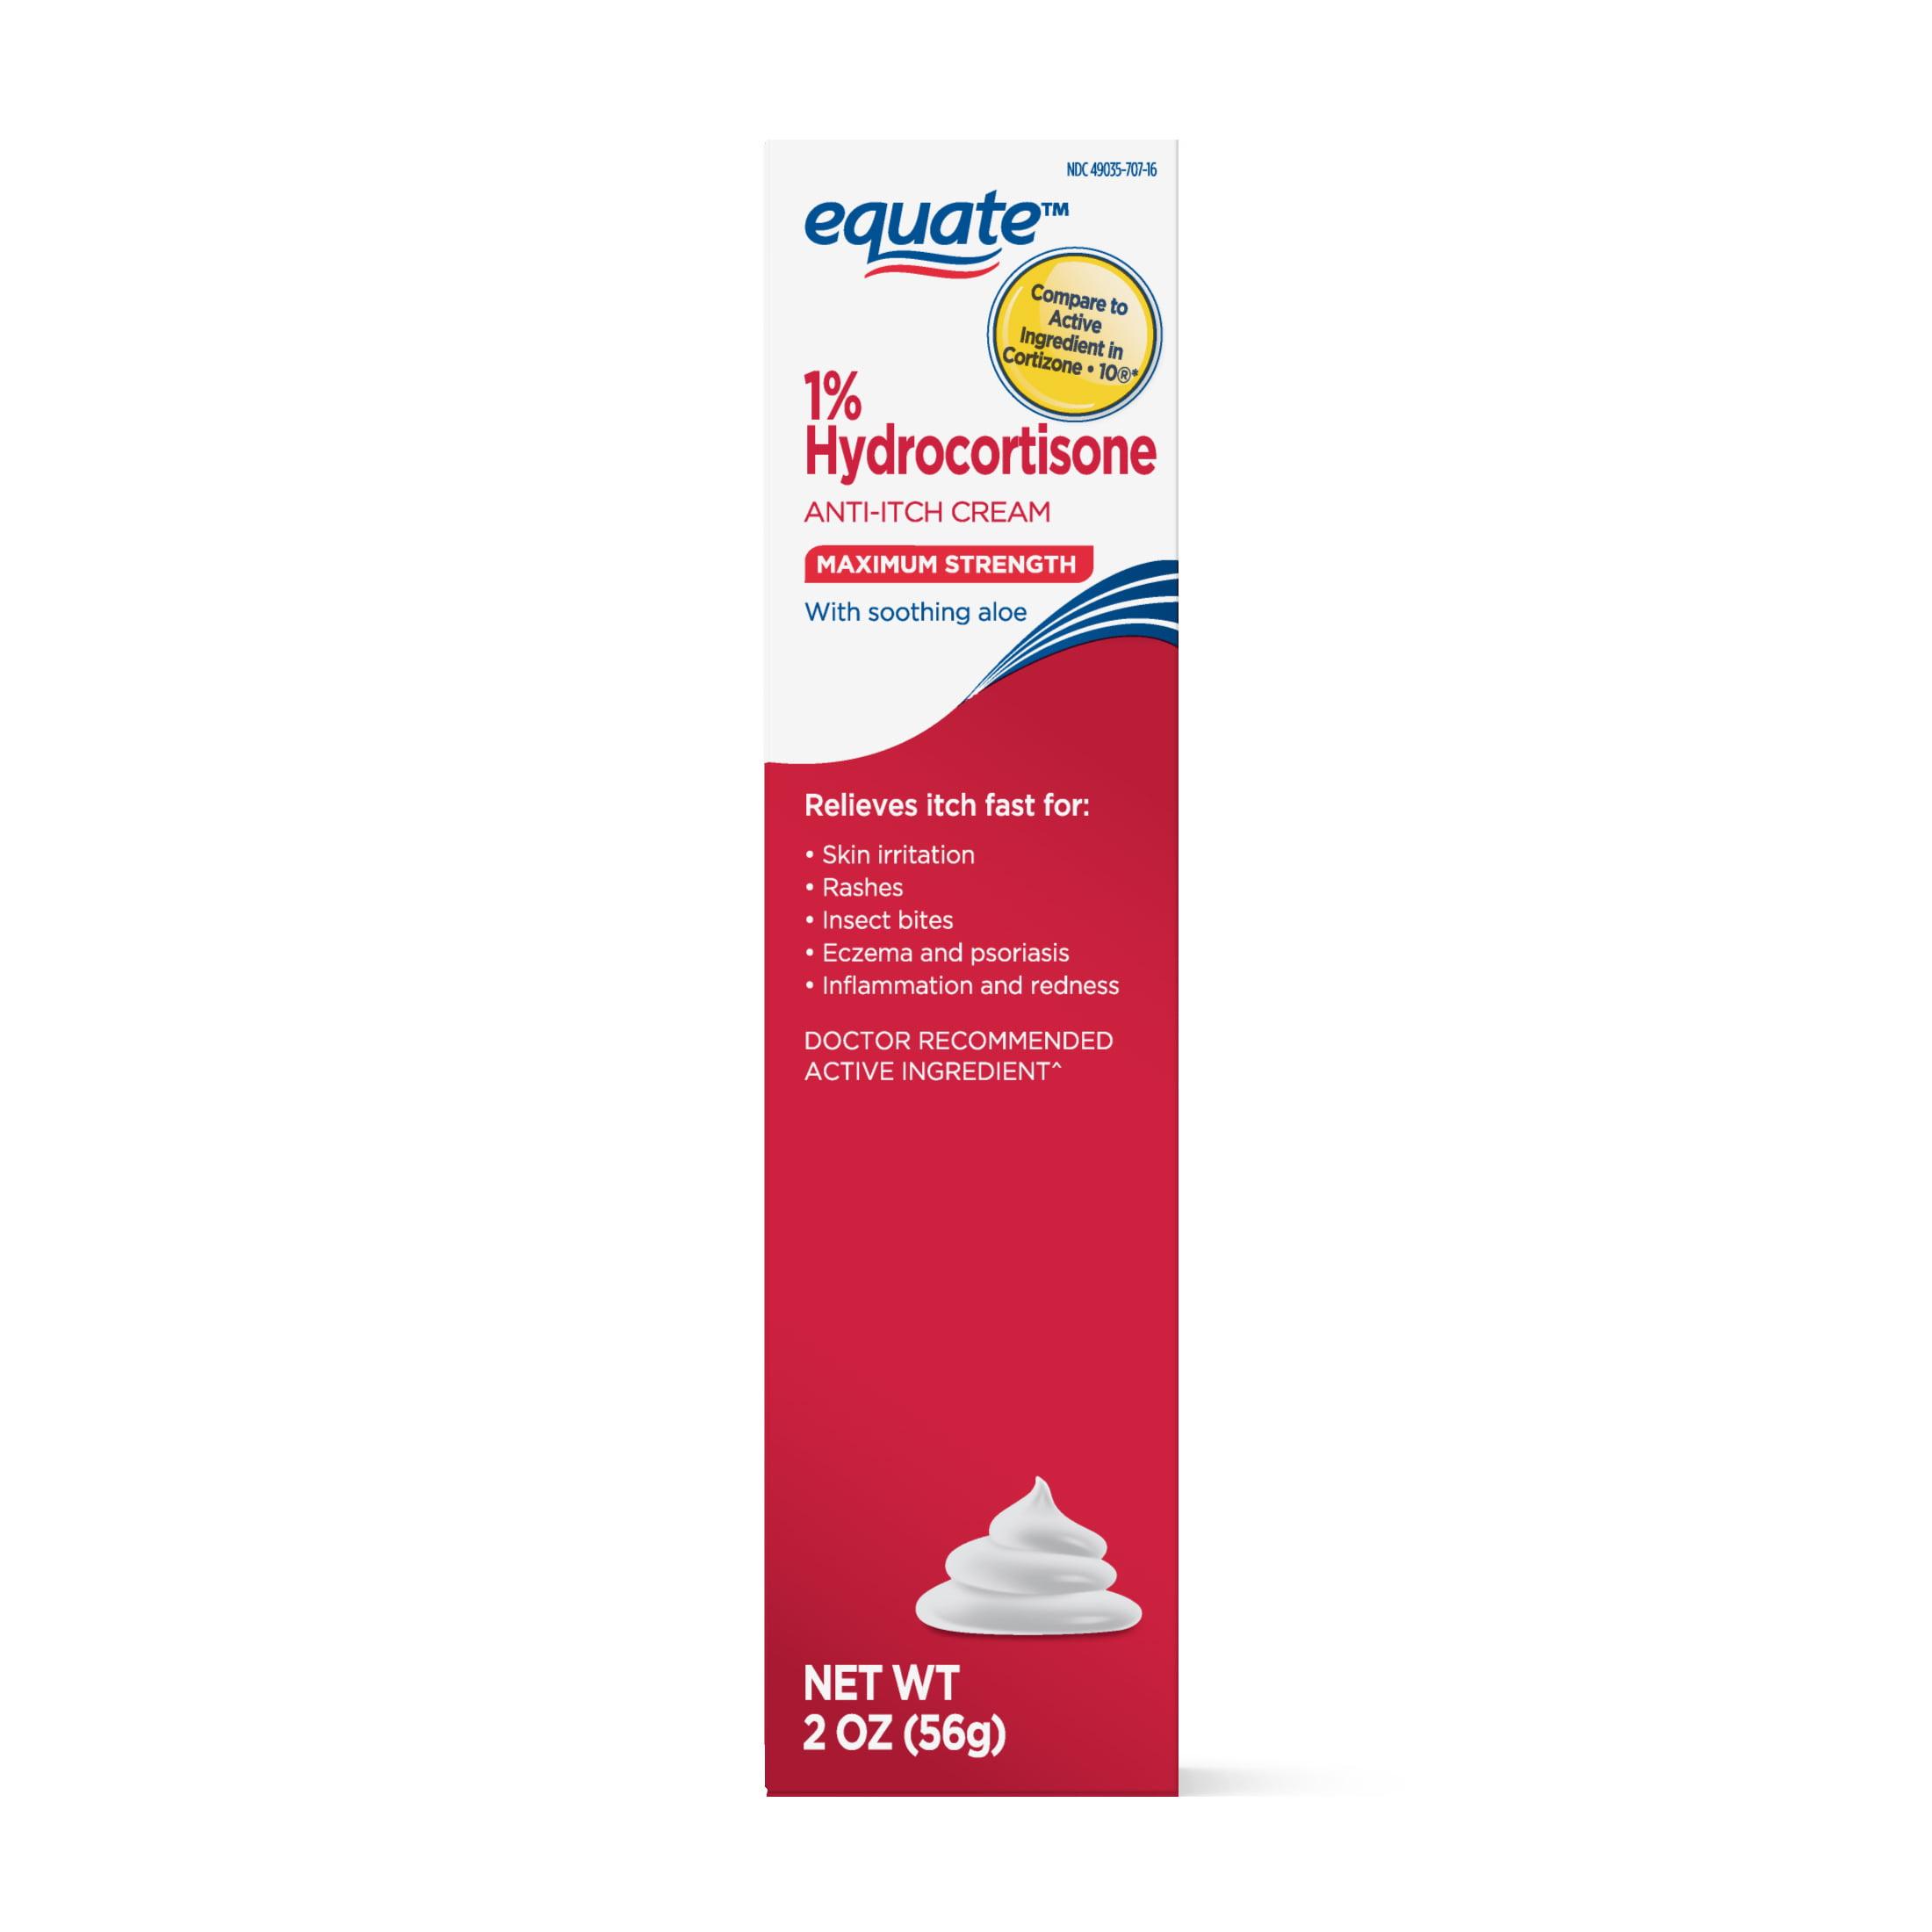 Equate Maximum Strength 1% Hydrocortisone With Aloe Cream, 2 Oz